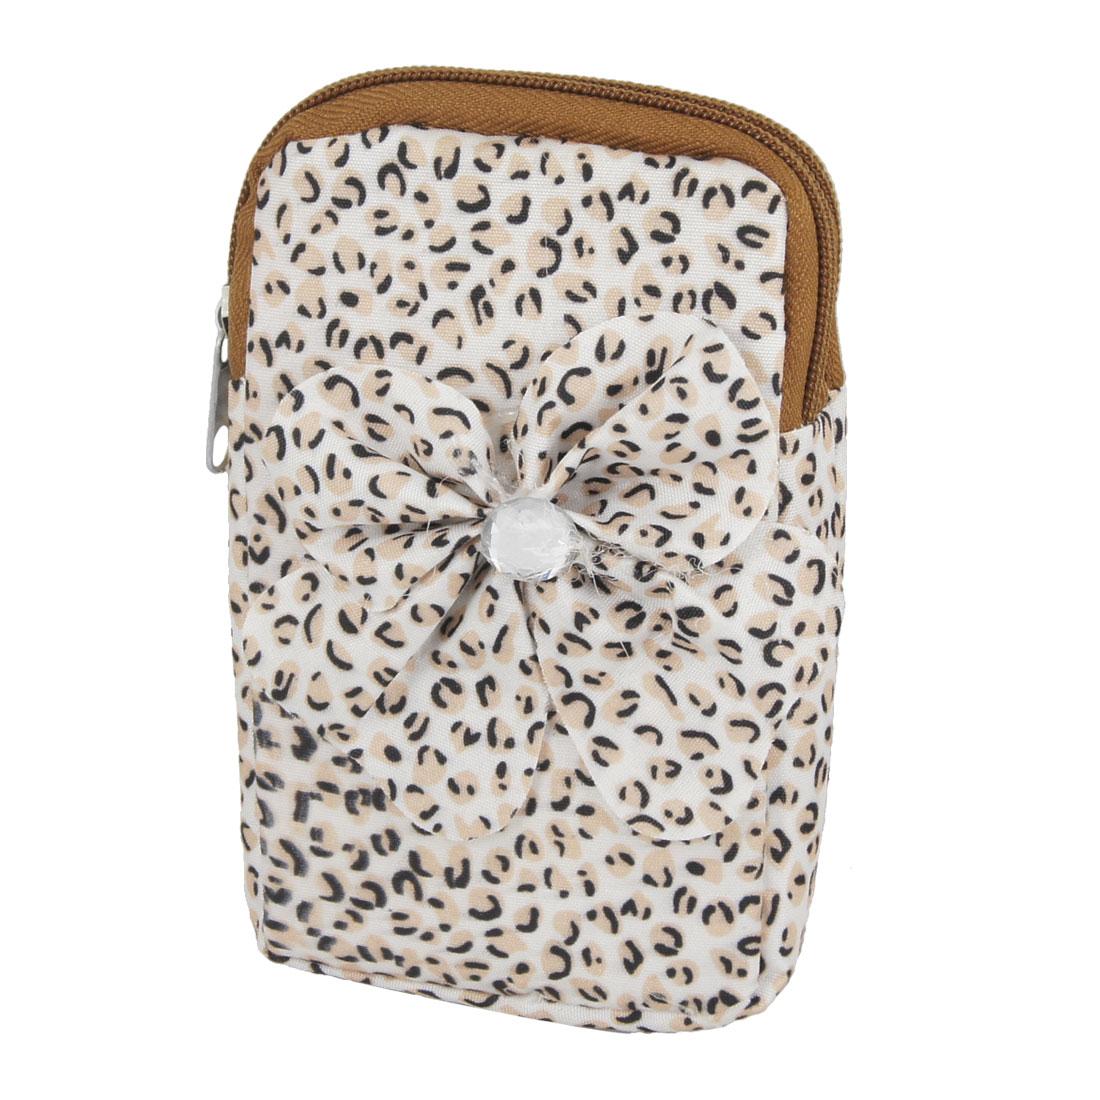 Khaki Black Leopard Pattern Zipper Closure Cell Phone Wrist Bag